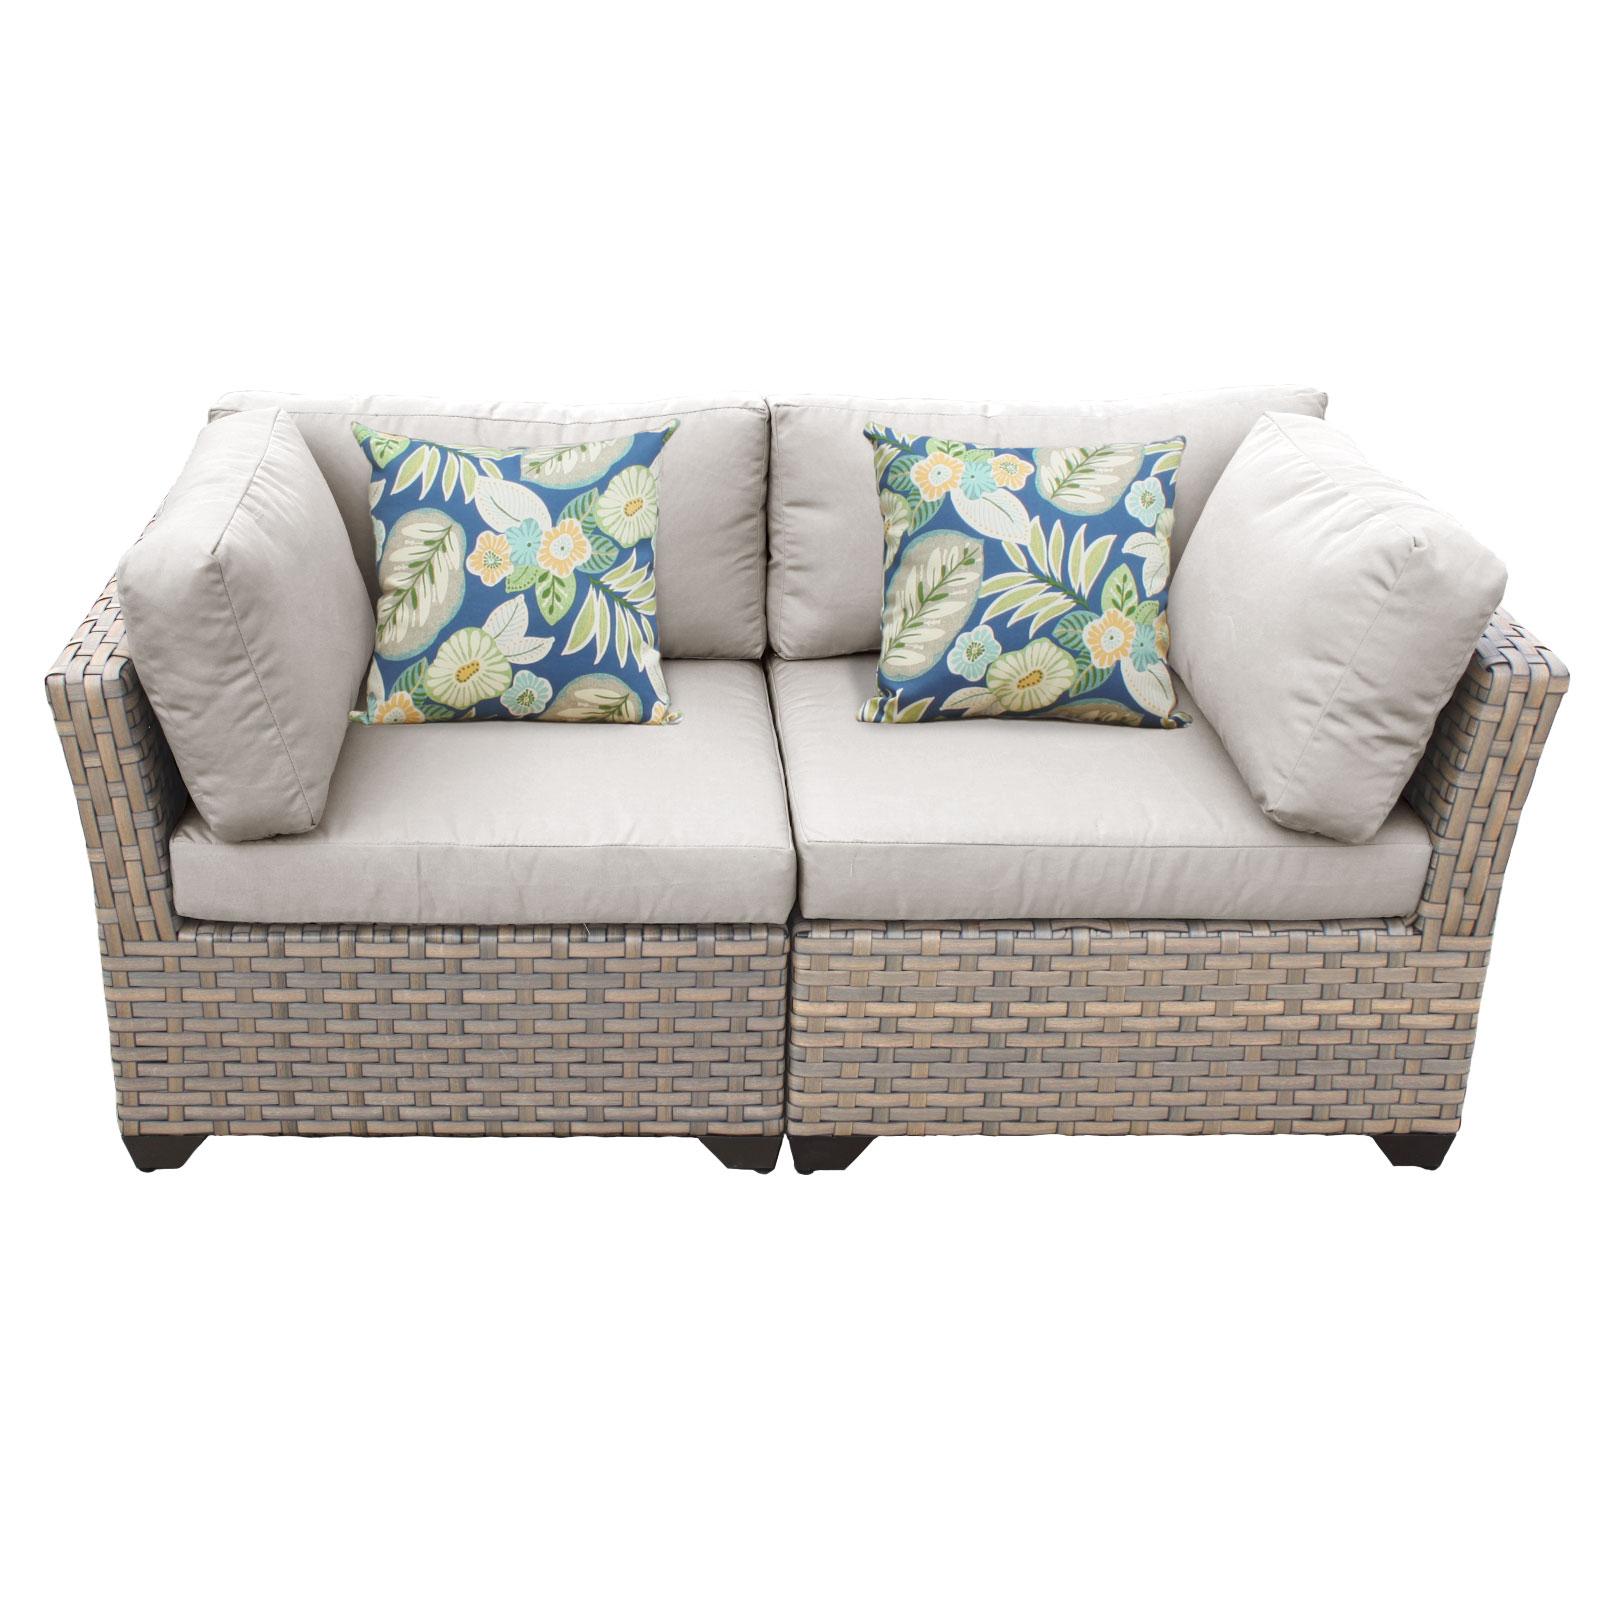 Hampton 2 Piece Outdoor Wicker Patio Furniture Set 02a